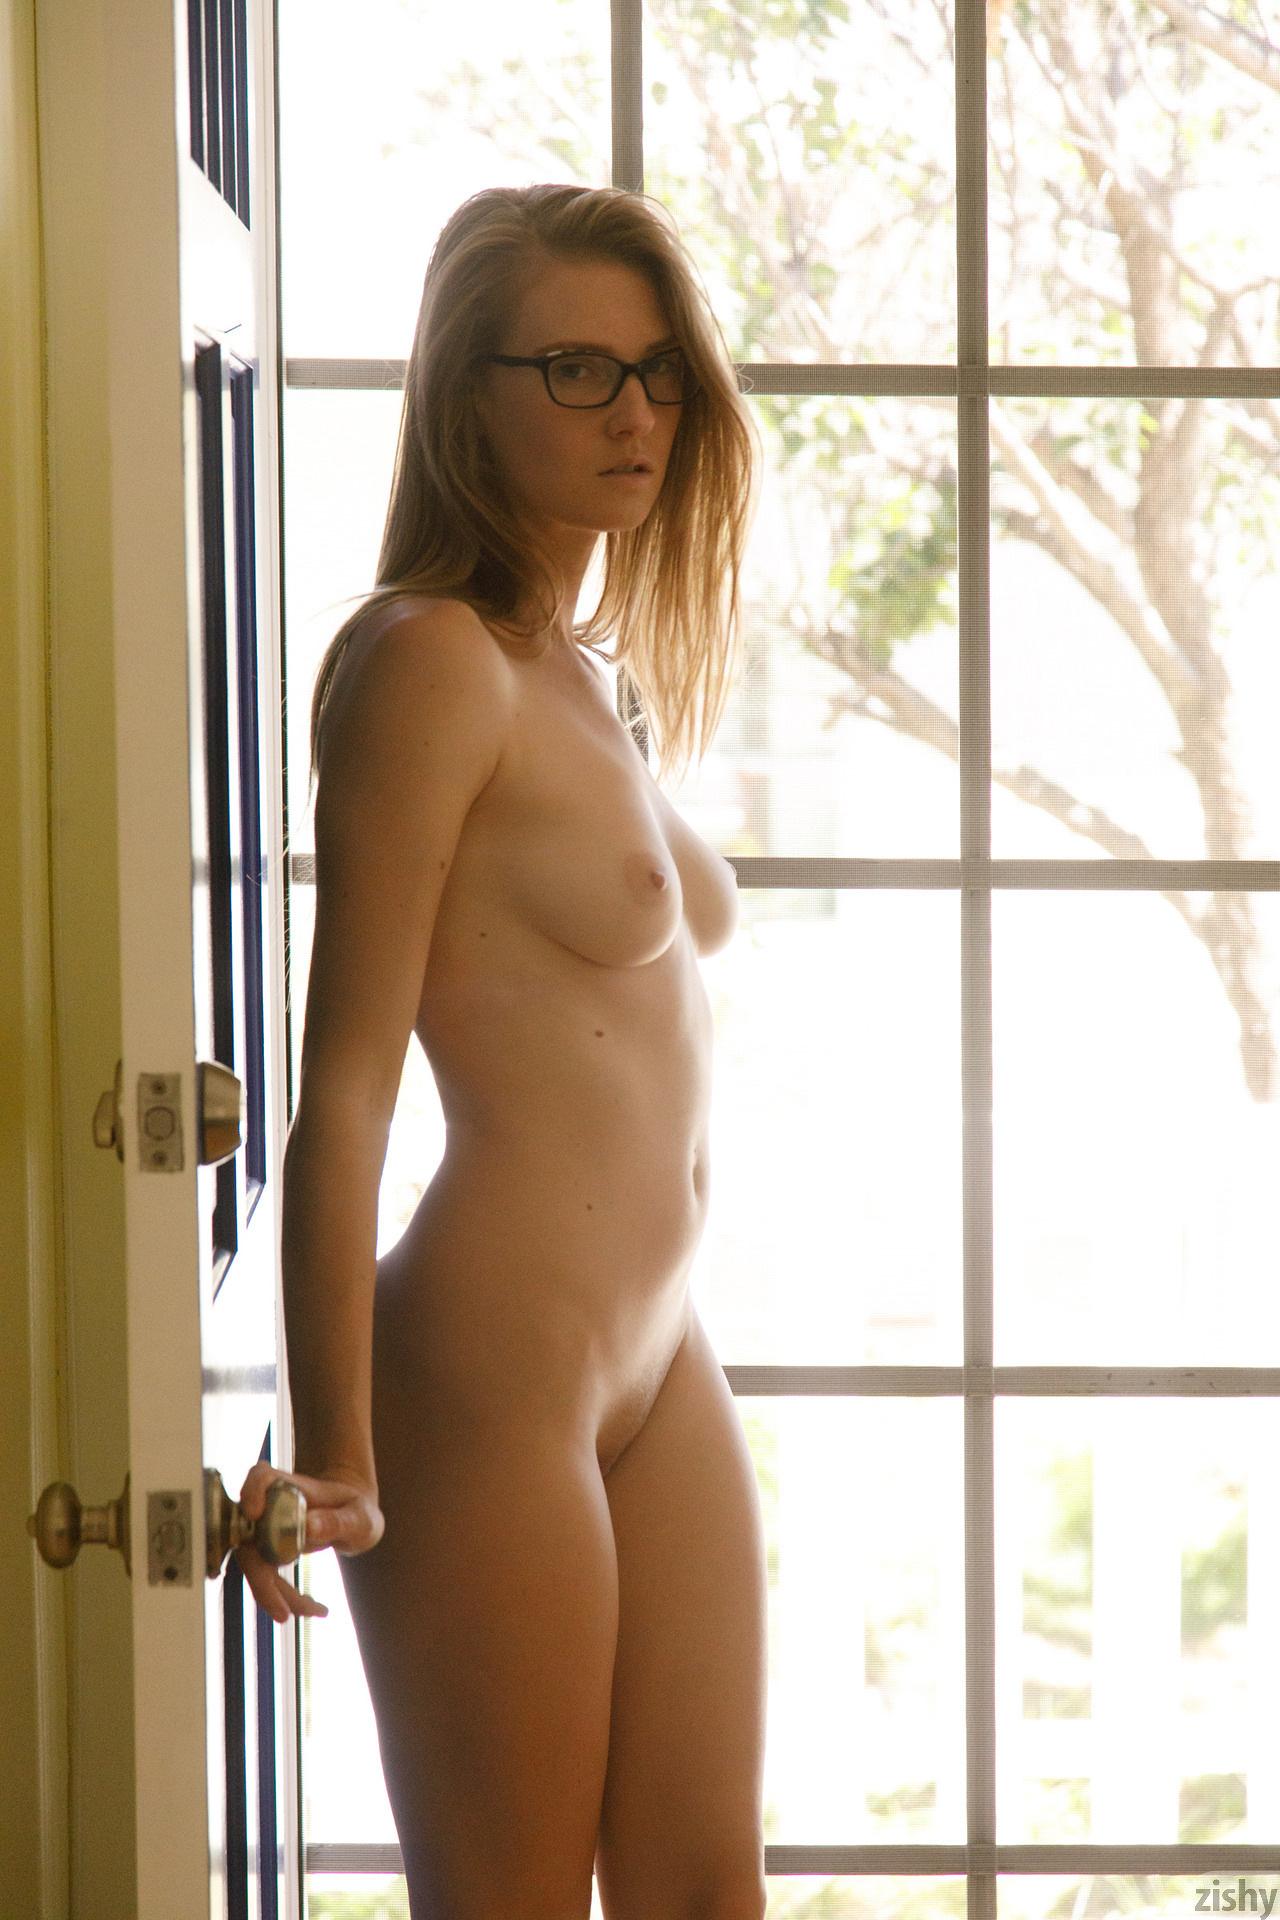 Ashley Lane Everyday People Zishy (56)